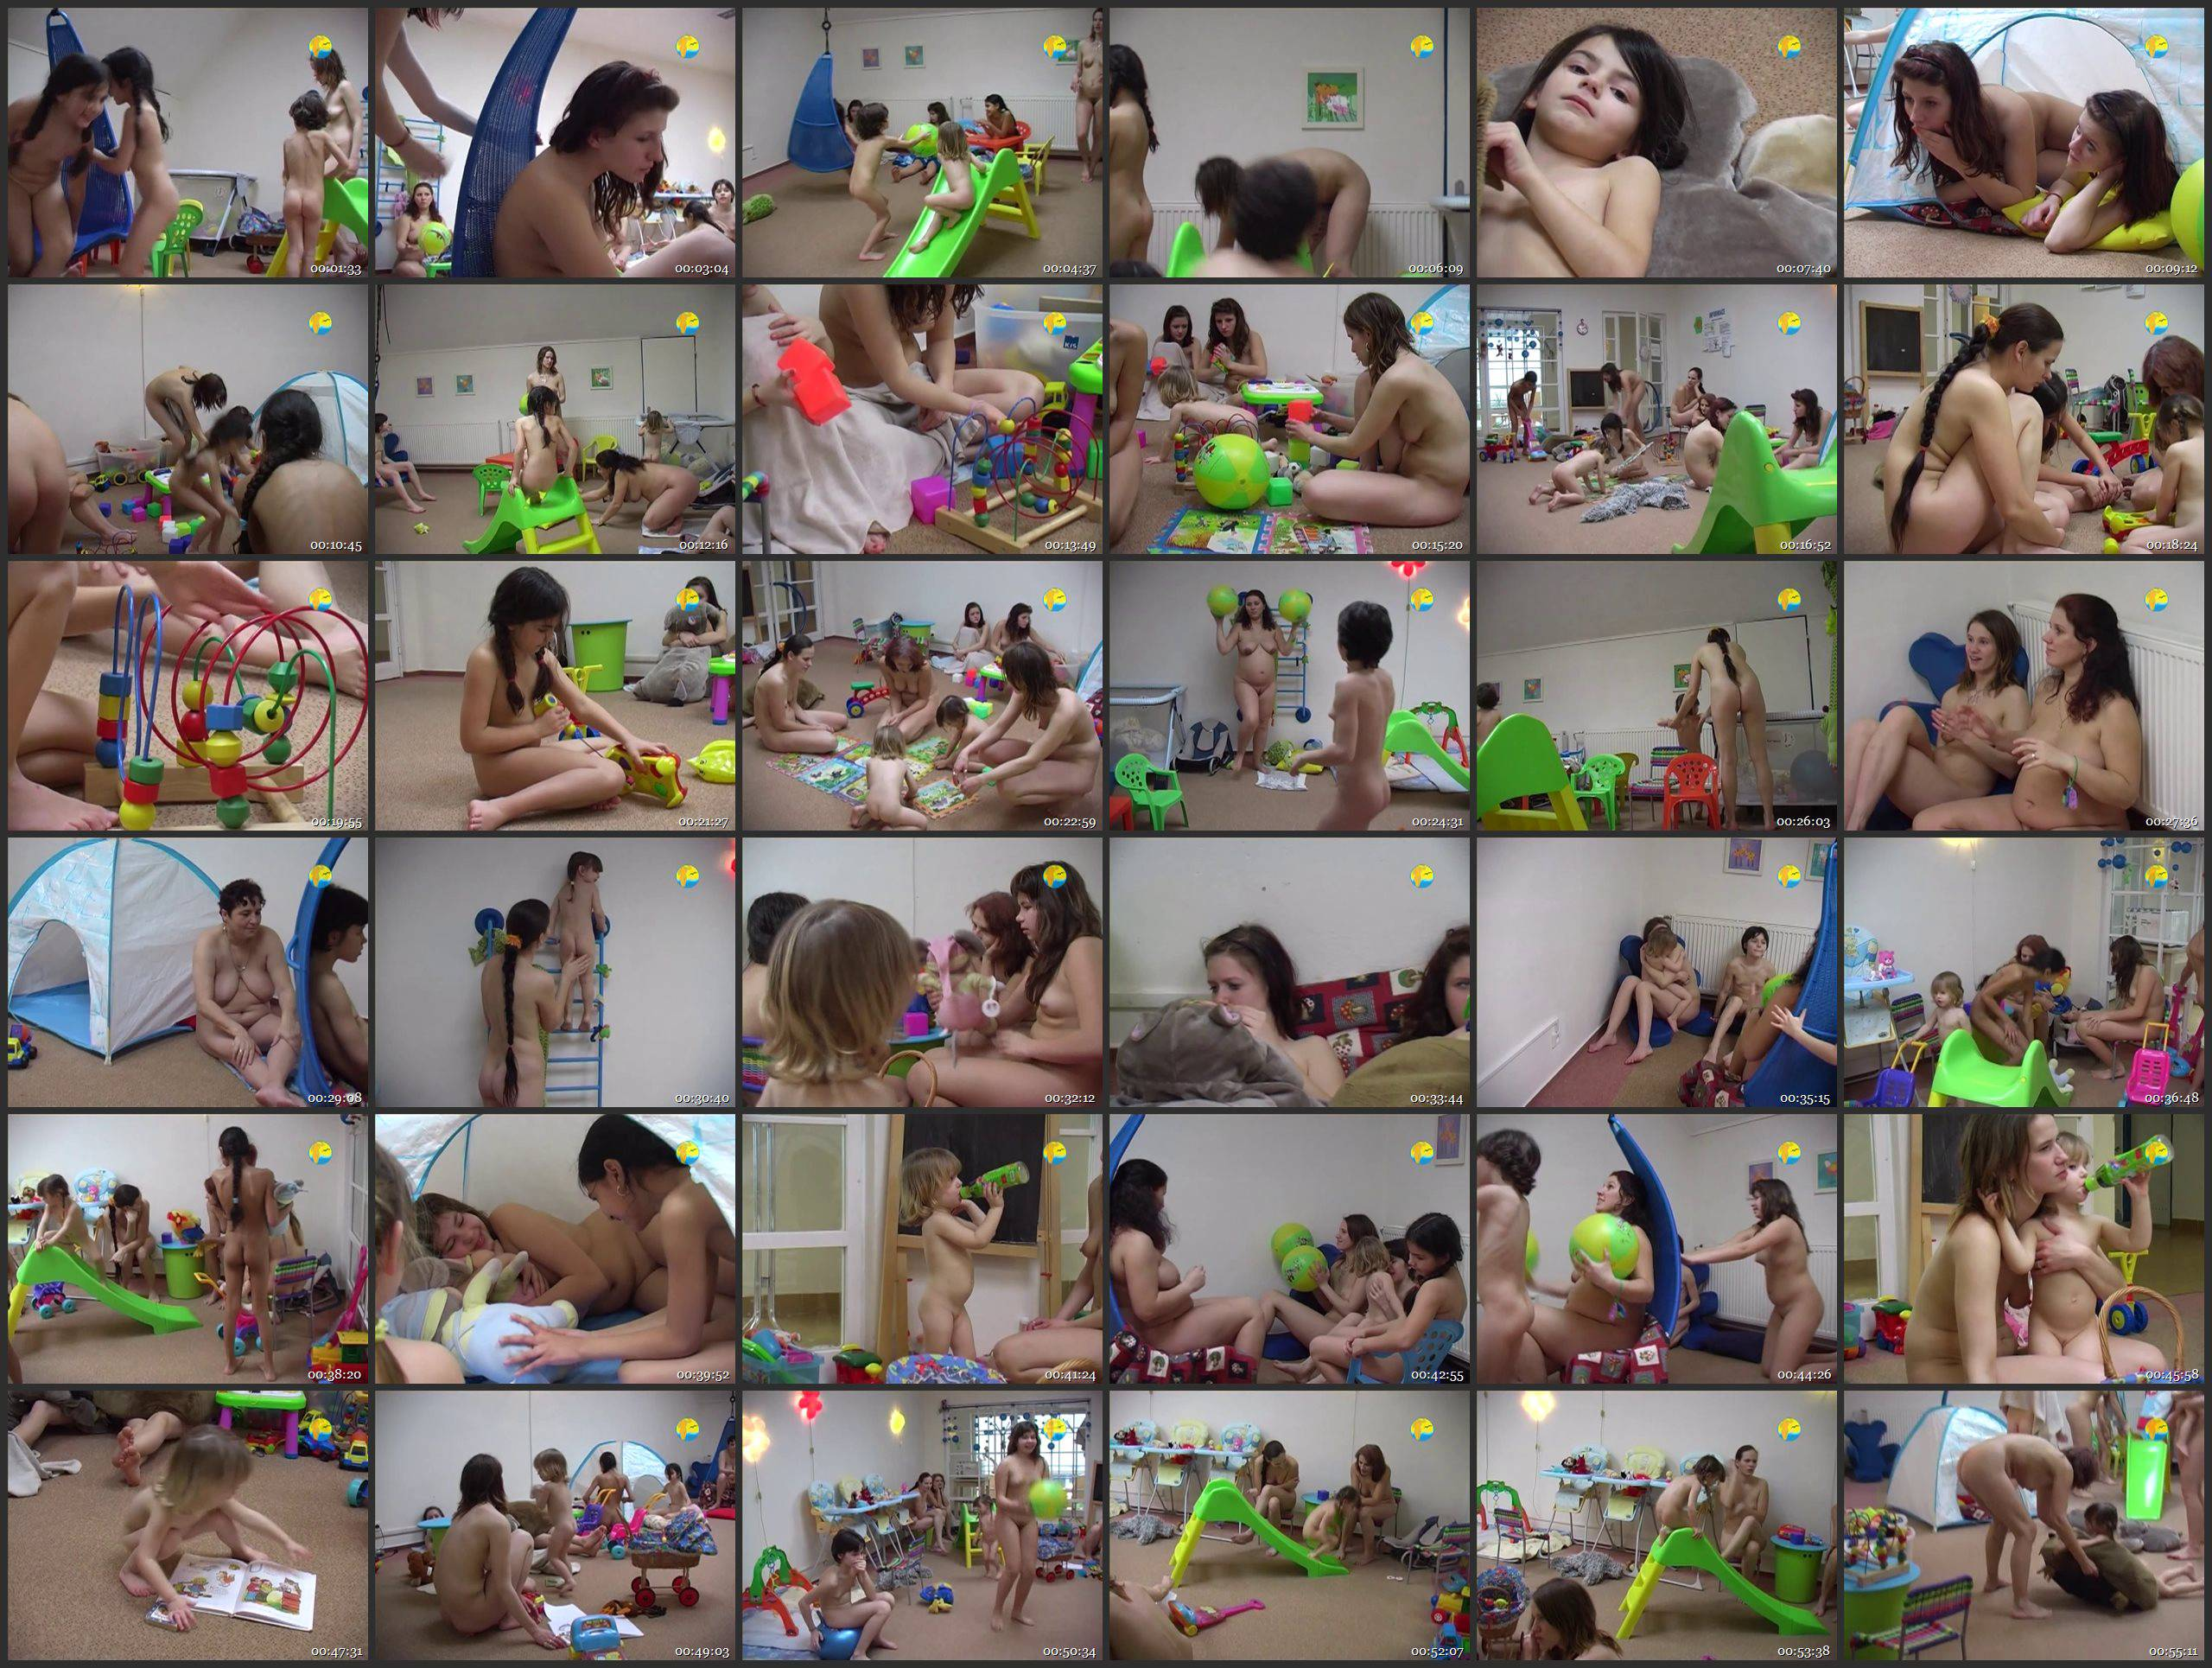 Naturist Freedom-Everybody Playing - Thumbnails